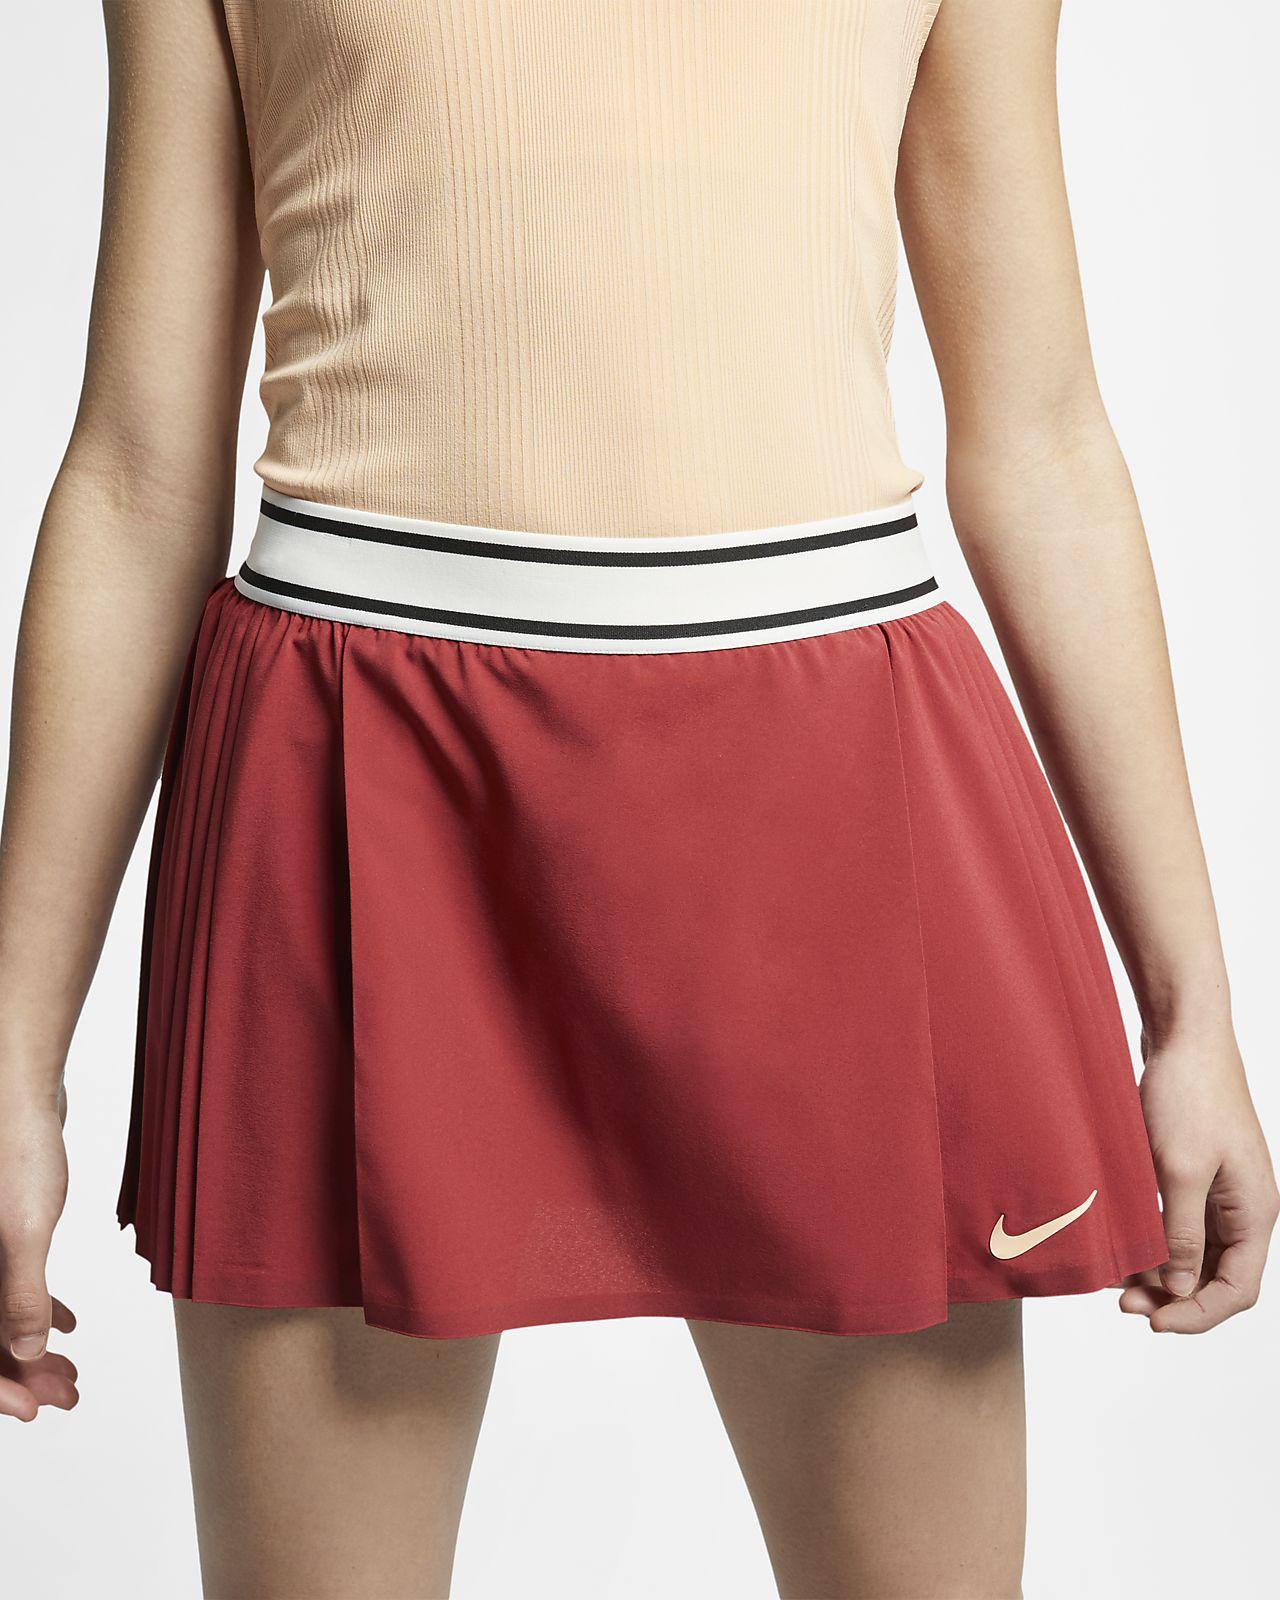 Damska spódniczka tenisowa NikeCourt Flex Maria Victory